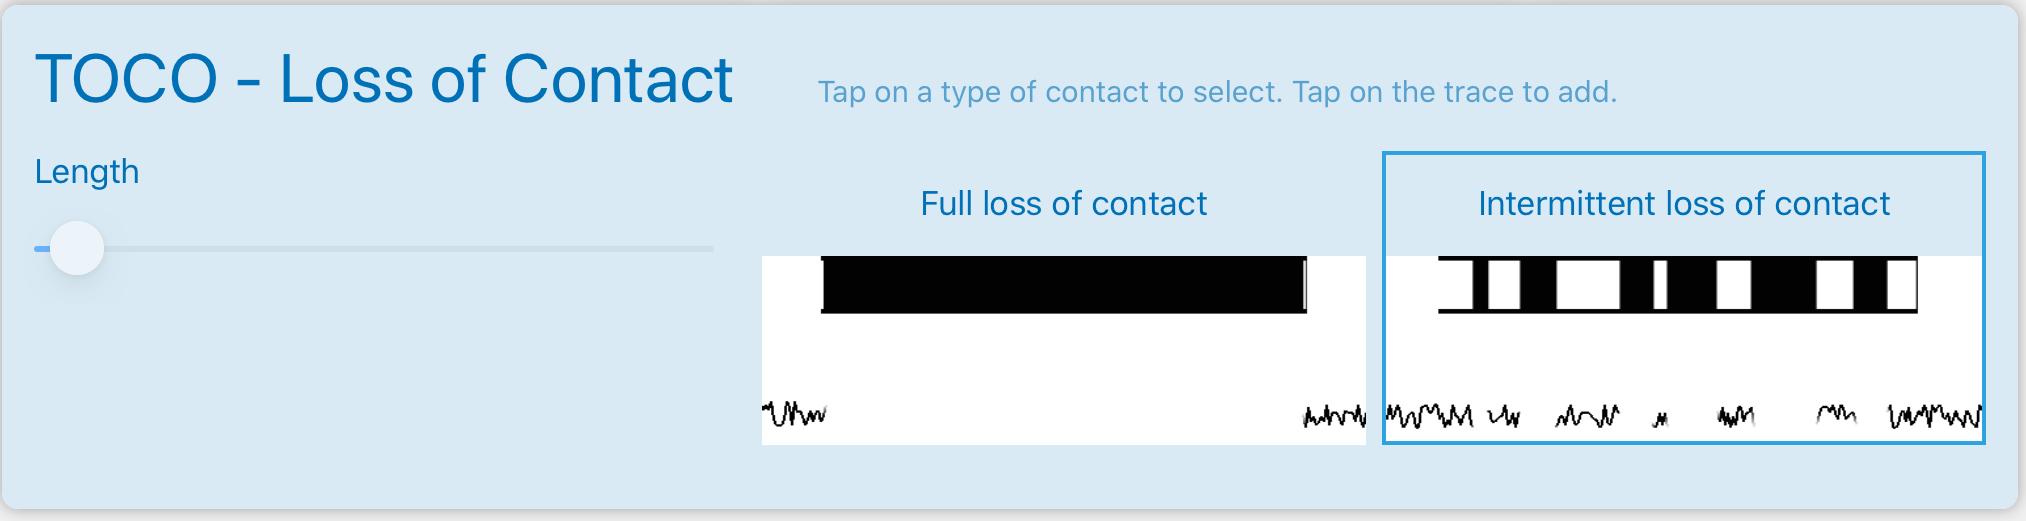 Facilitator_Toco_Contact_1.PNG